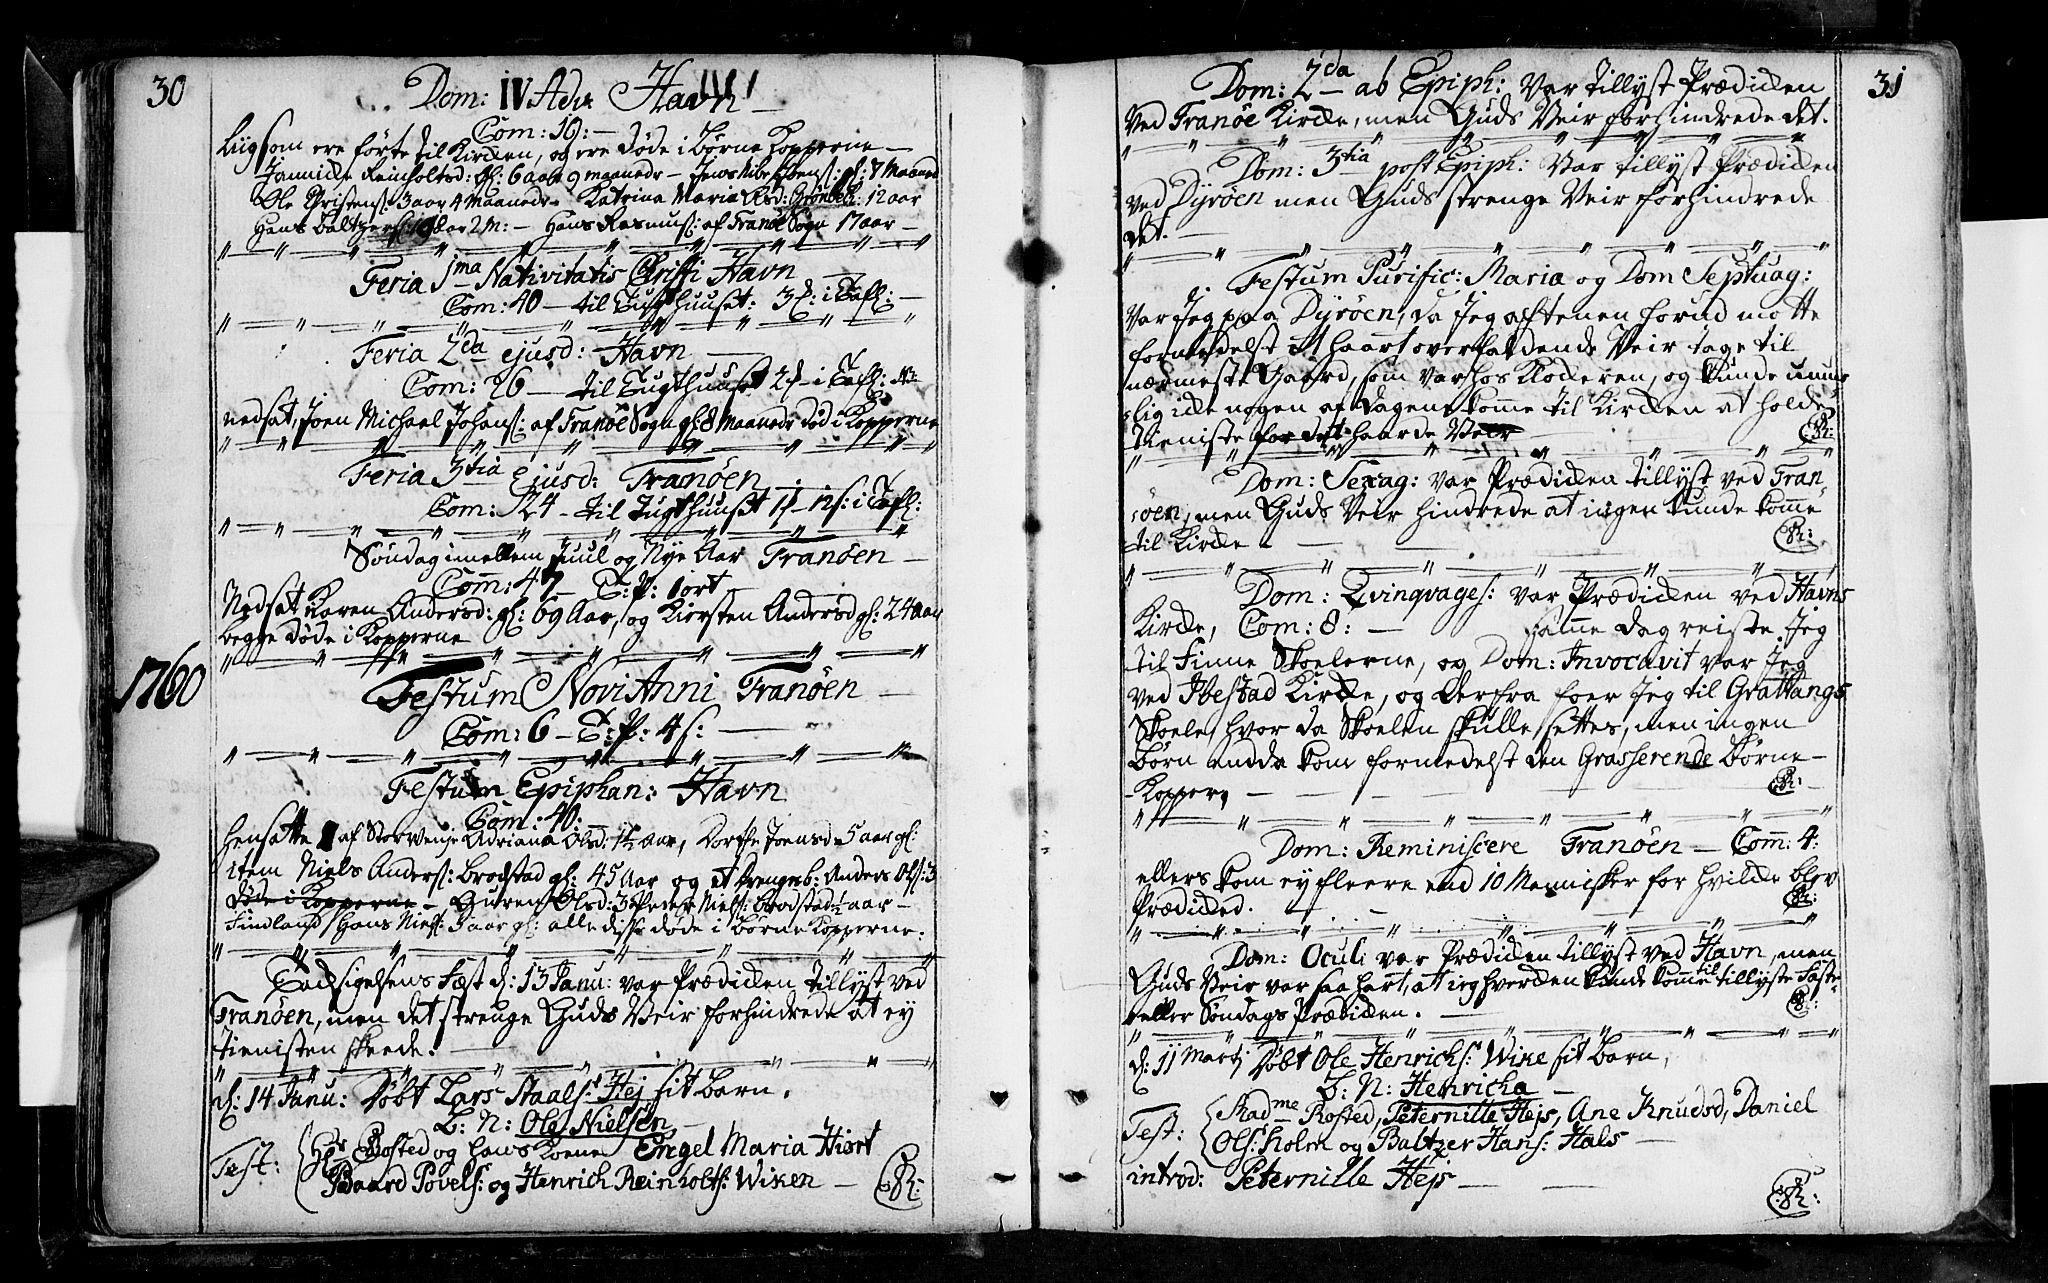 SATØ, Tranøy sokneprestkontor, I/Ia/Iaa/L0001kirke: Ministerialbok nr. 1, 1757-1773, s. 30-31